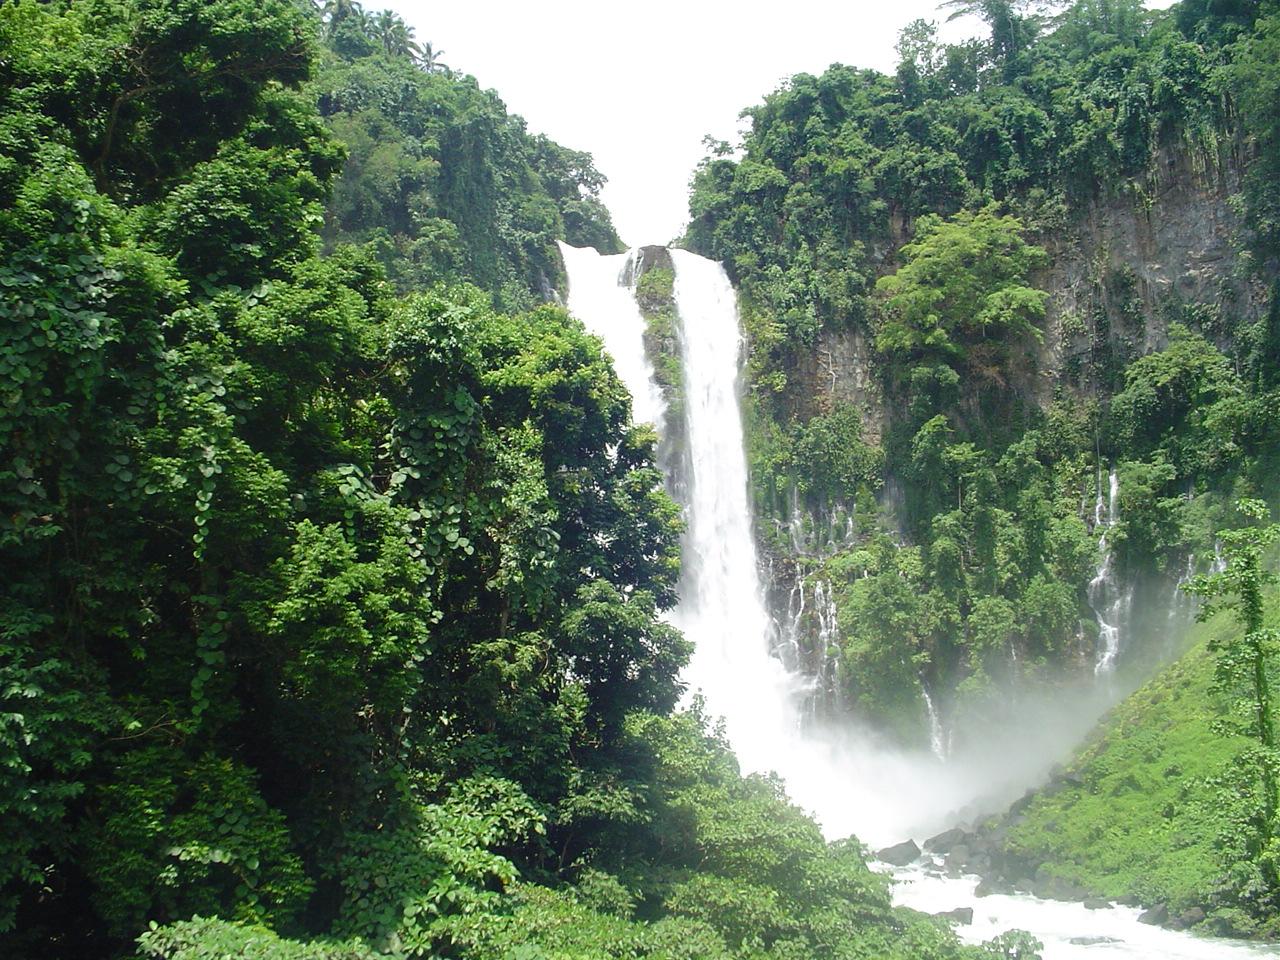 File:MariaCristinaFallsJuly2006.jpg - Wikimedia Commons